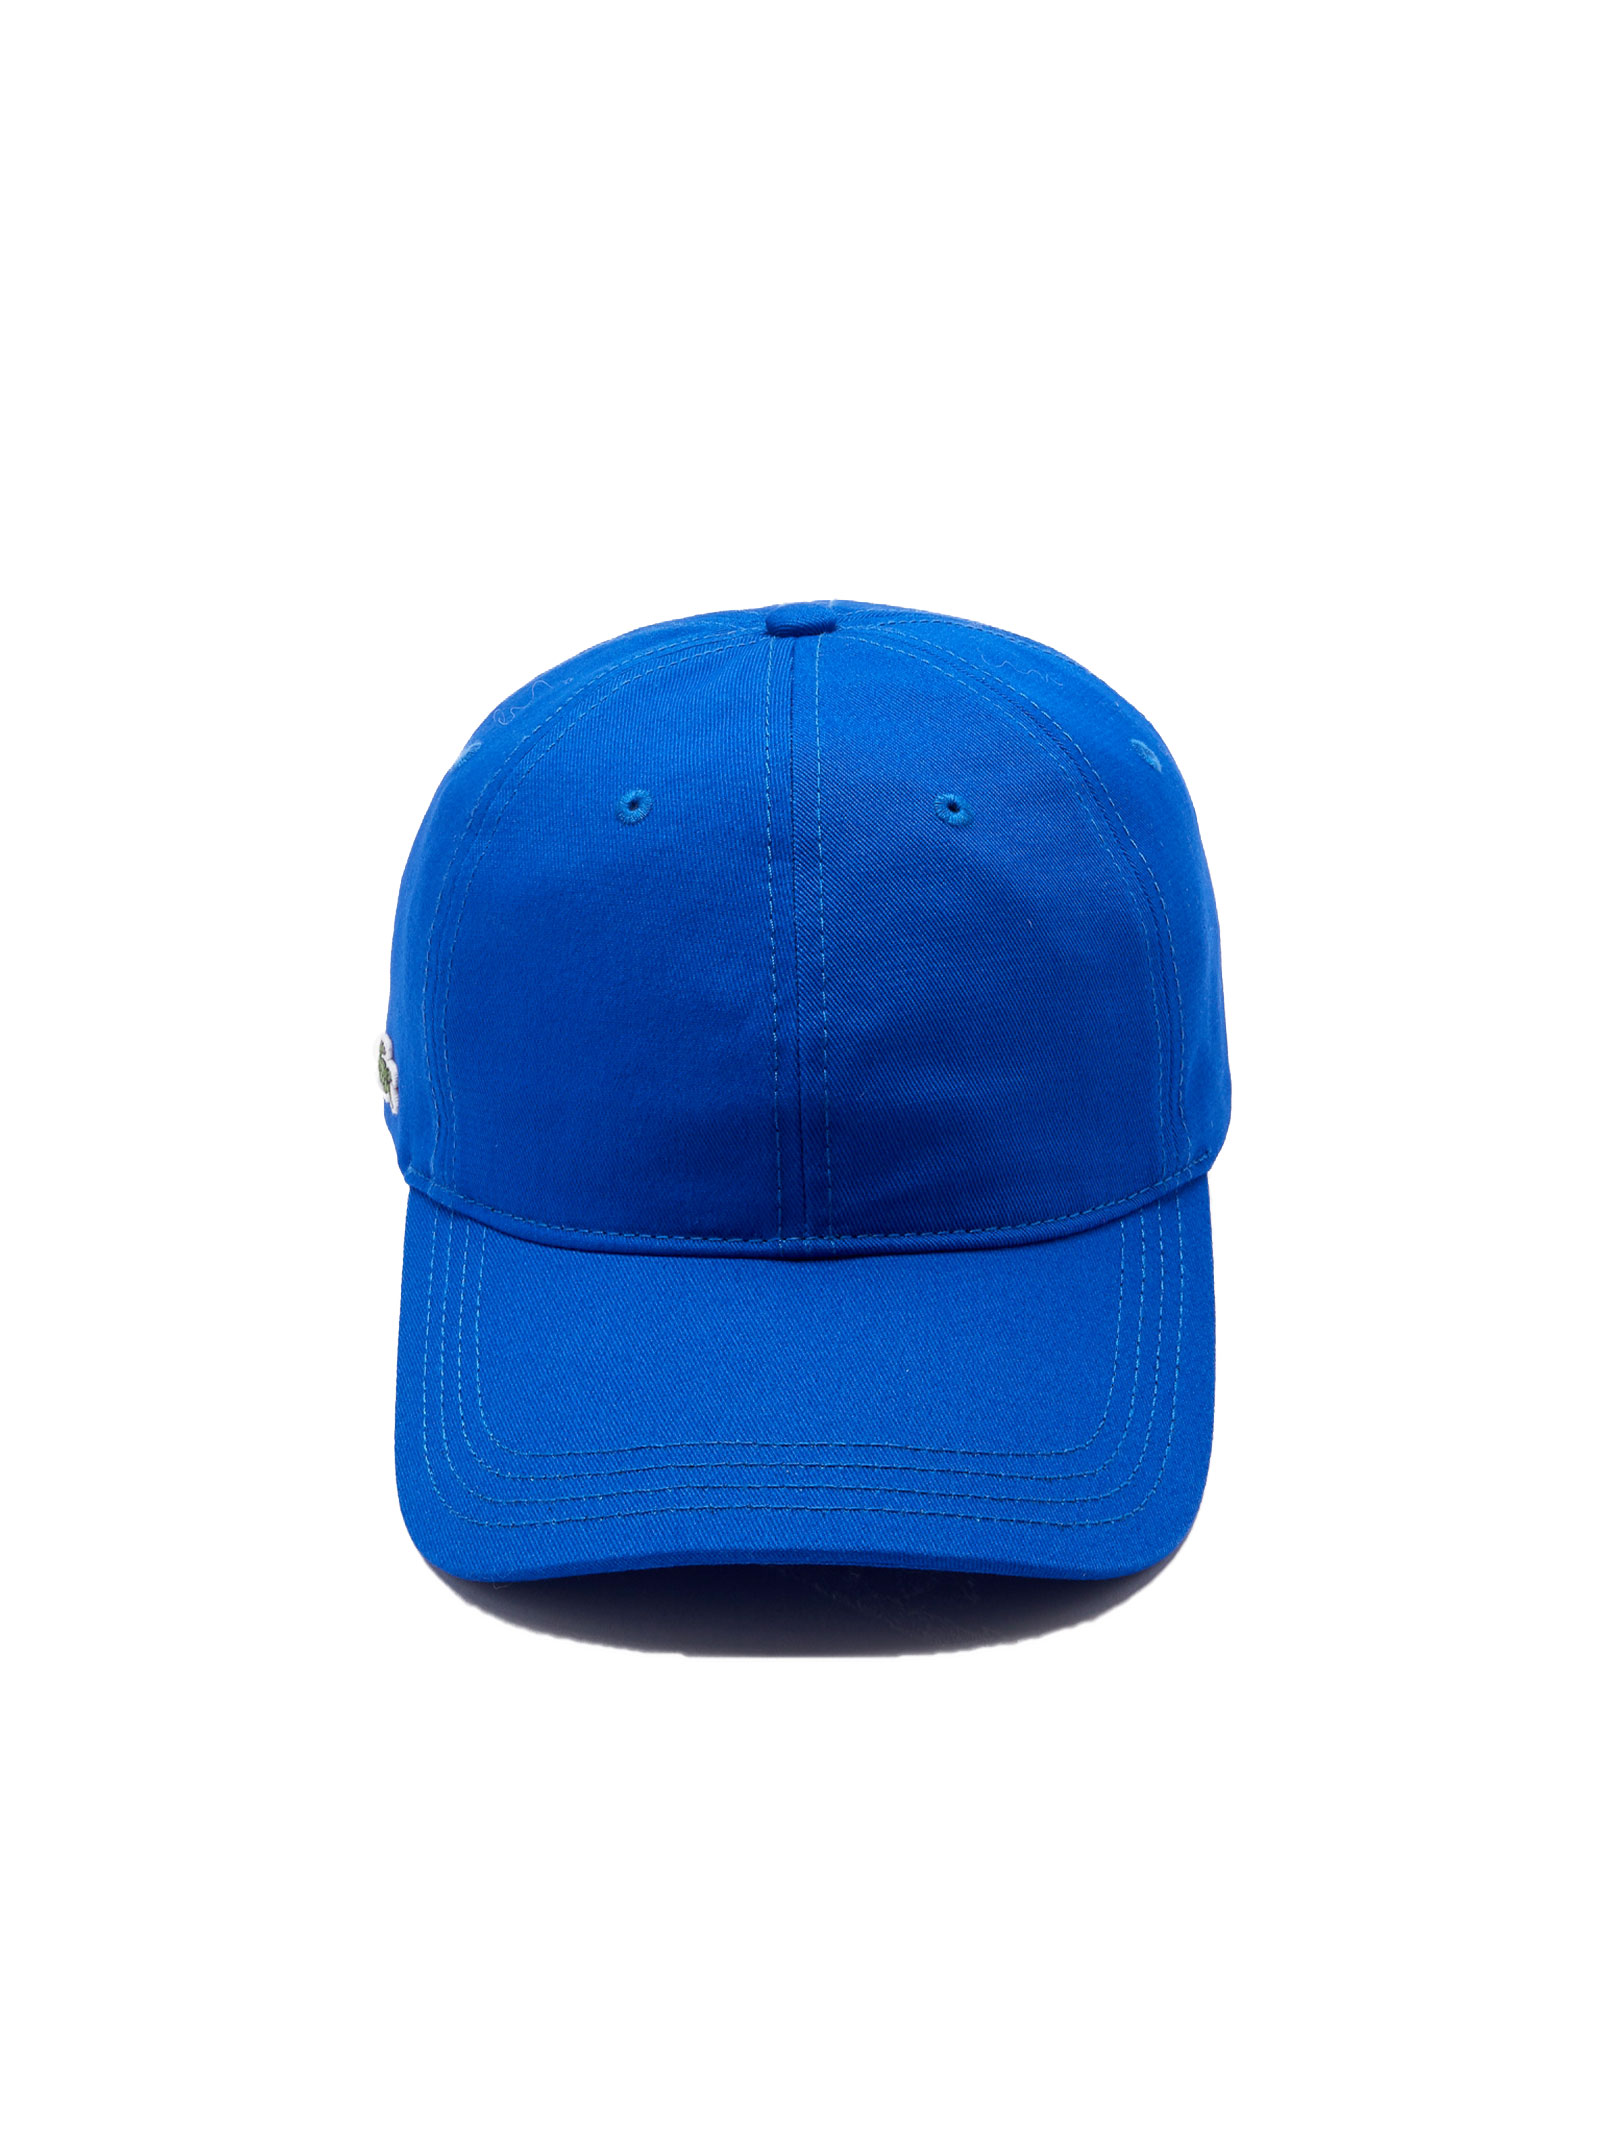 LACOSTE | Hats | RK4709HJM